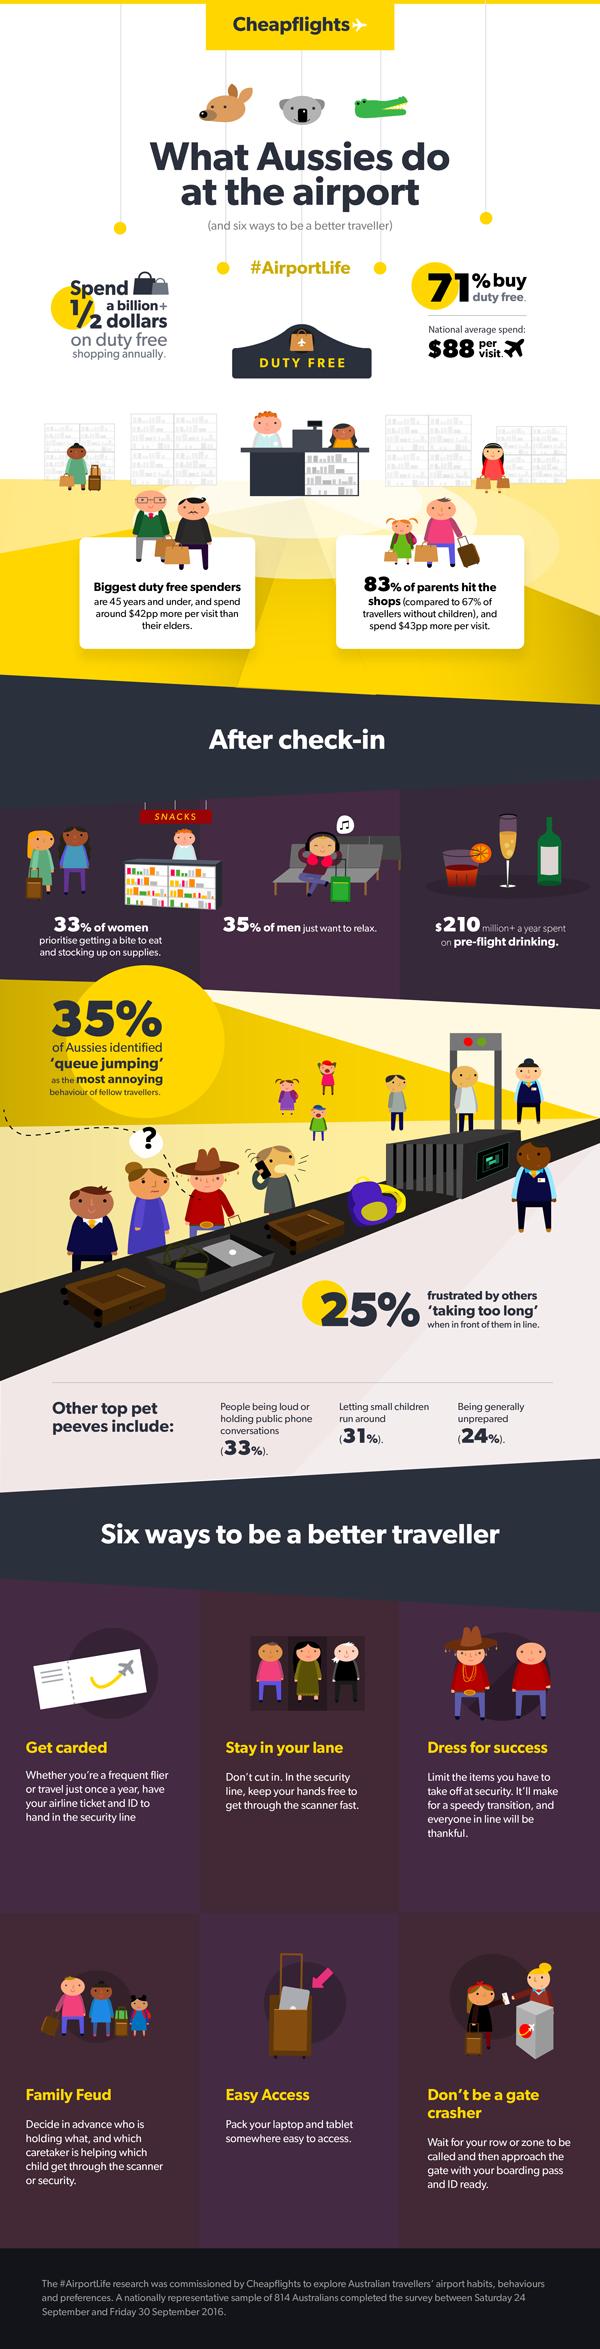 infographic-aus-airport